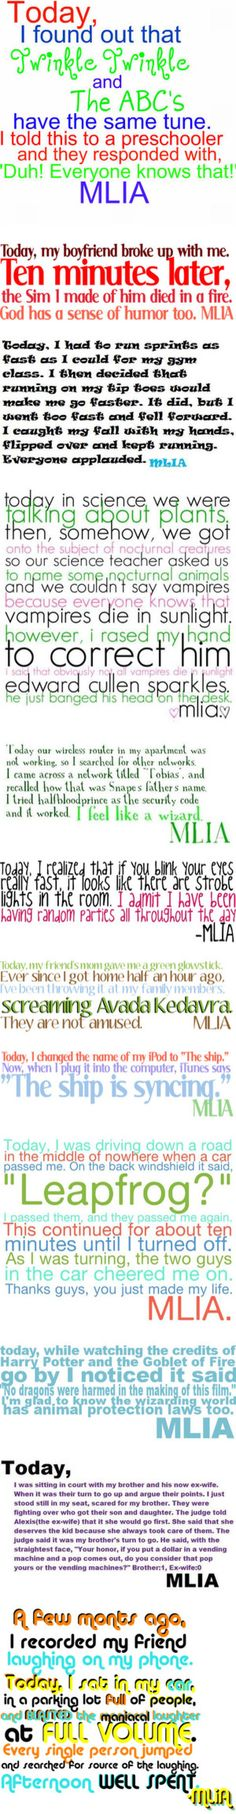 """MLIA!"" by judithbarranco on Polyvore"